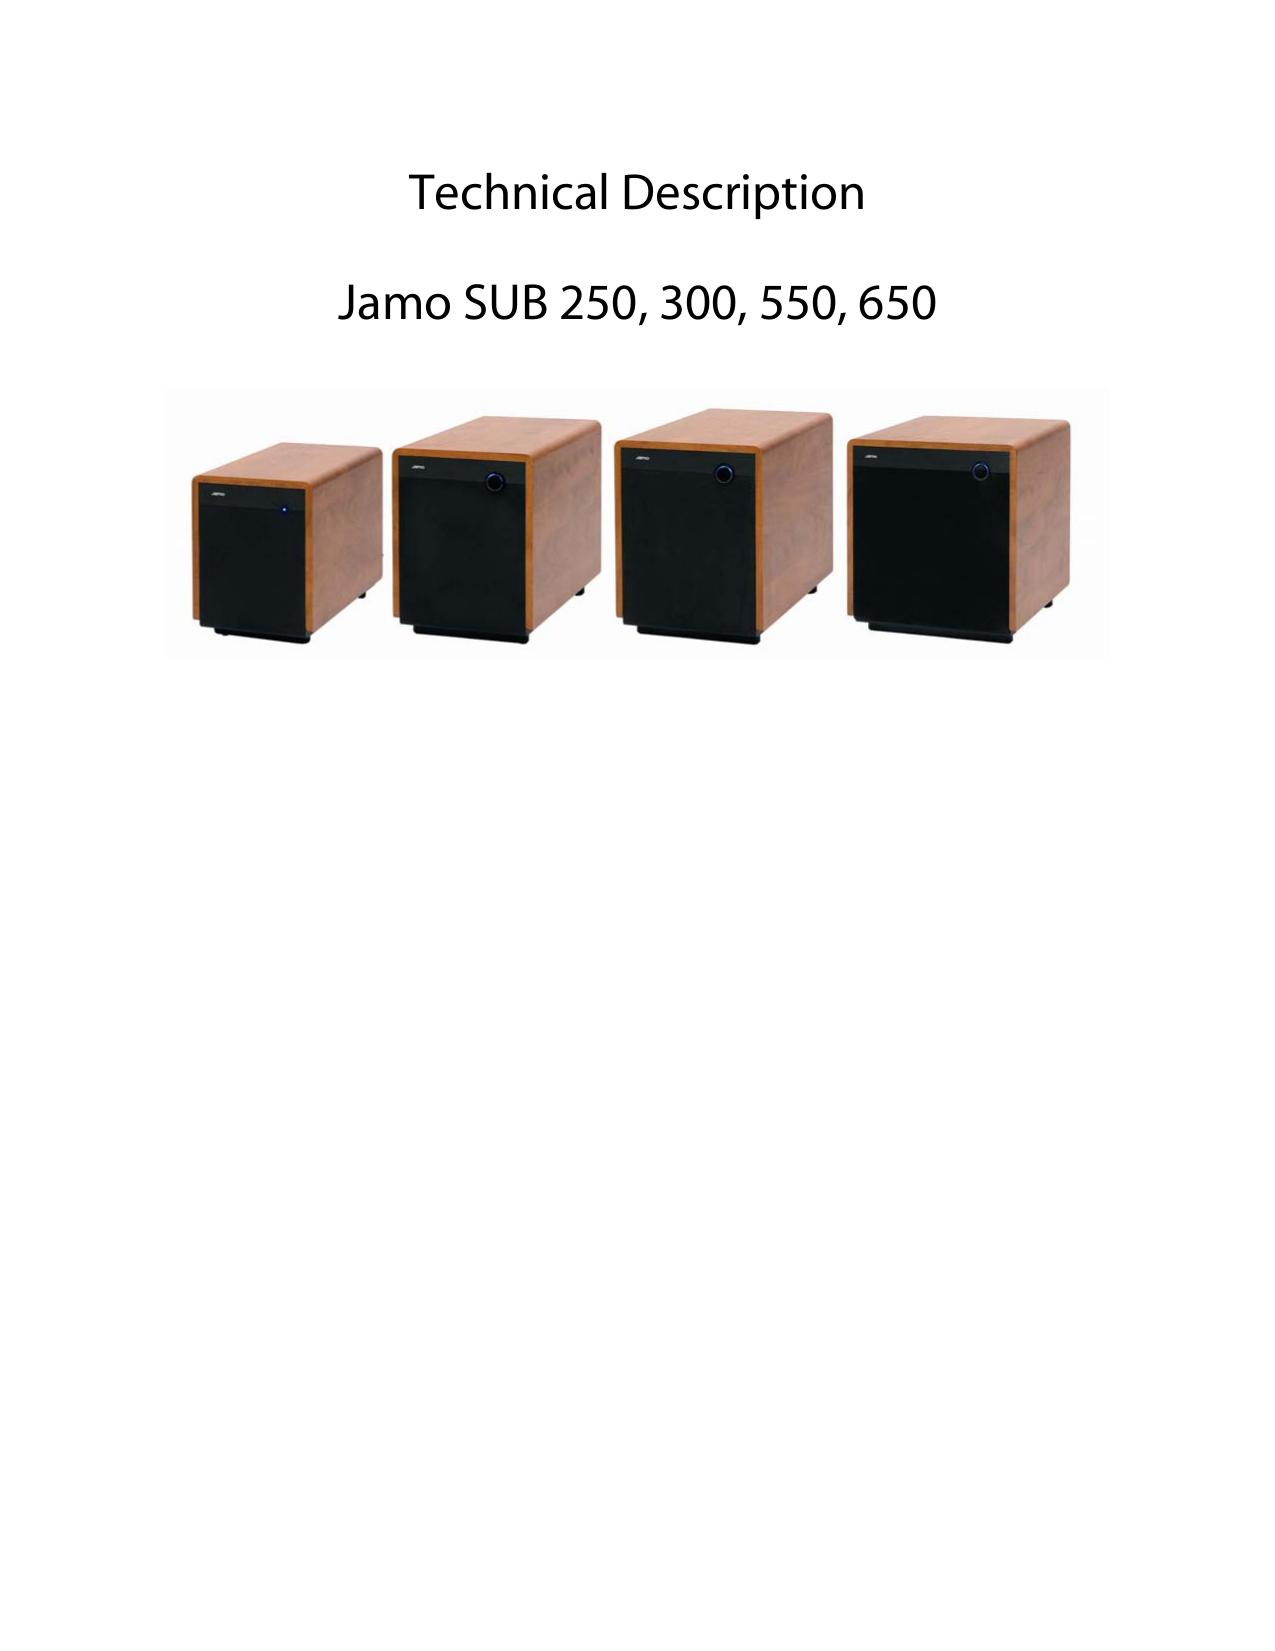 pdf for Jamo Subwoofer SUB 550 manual